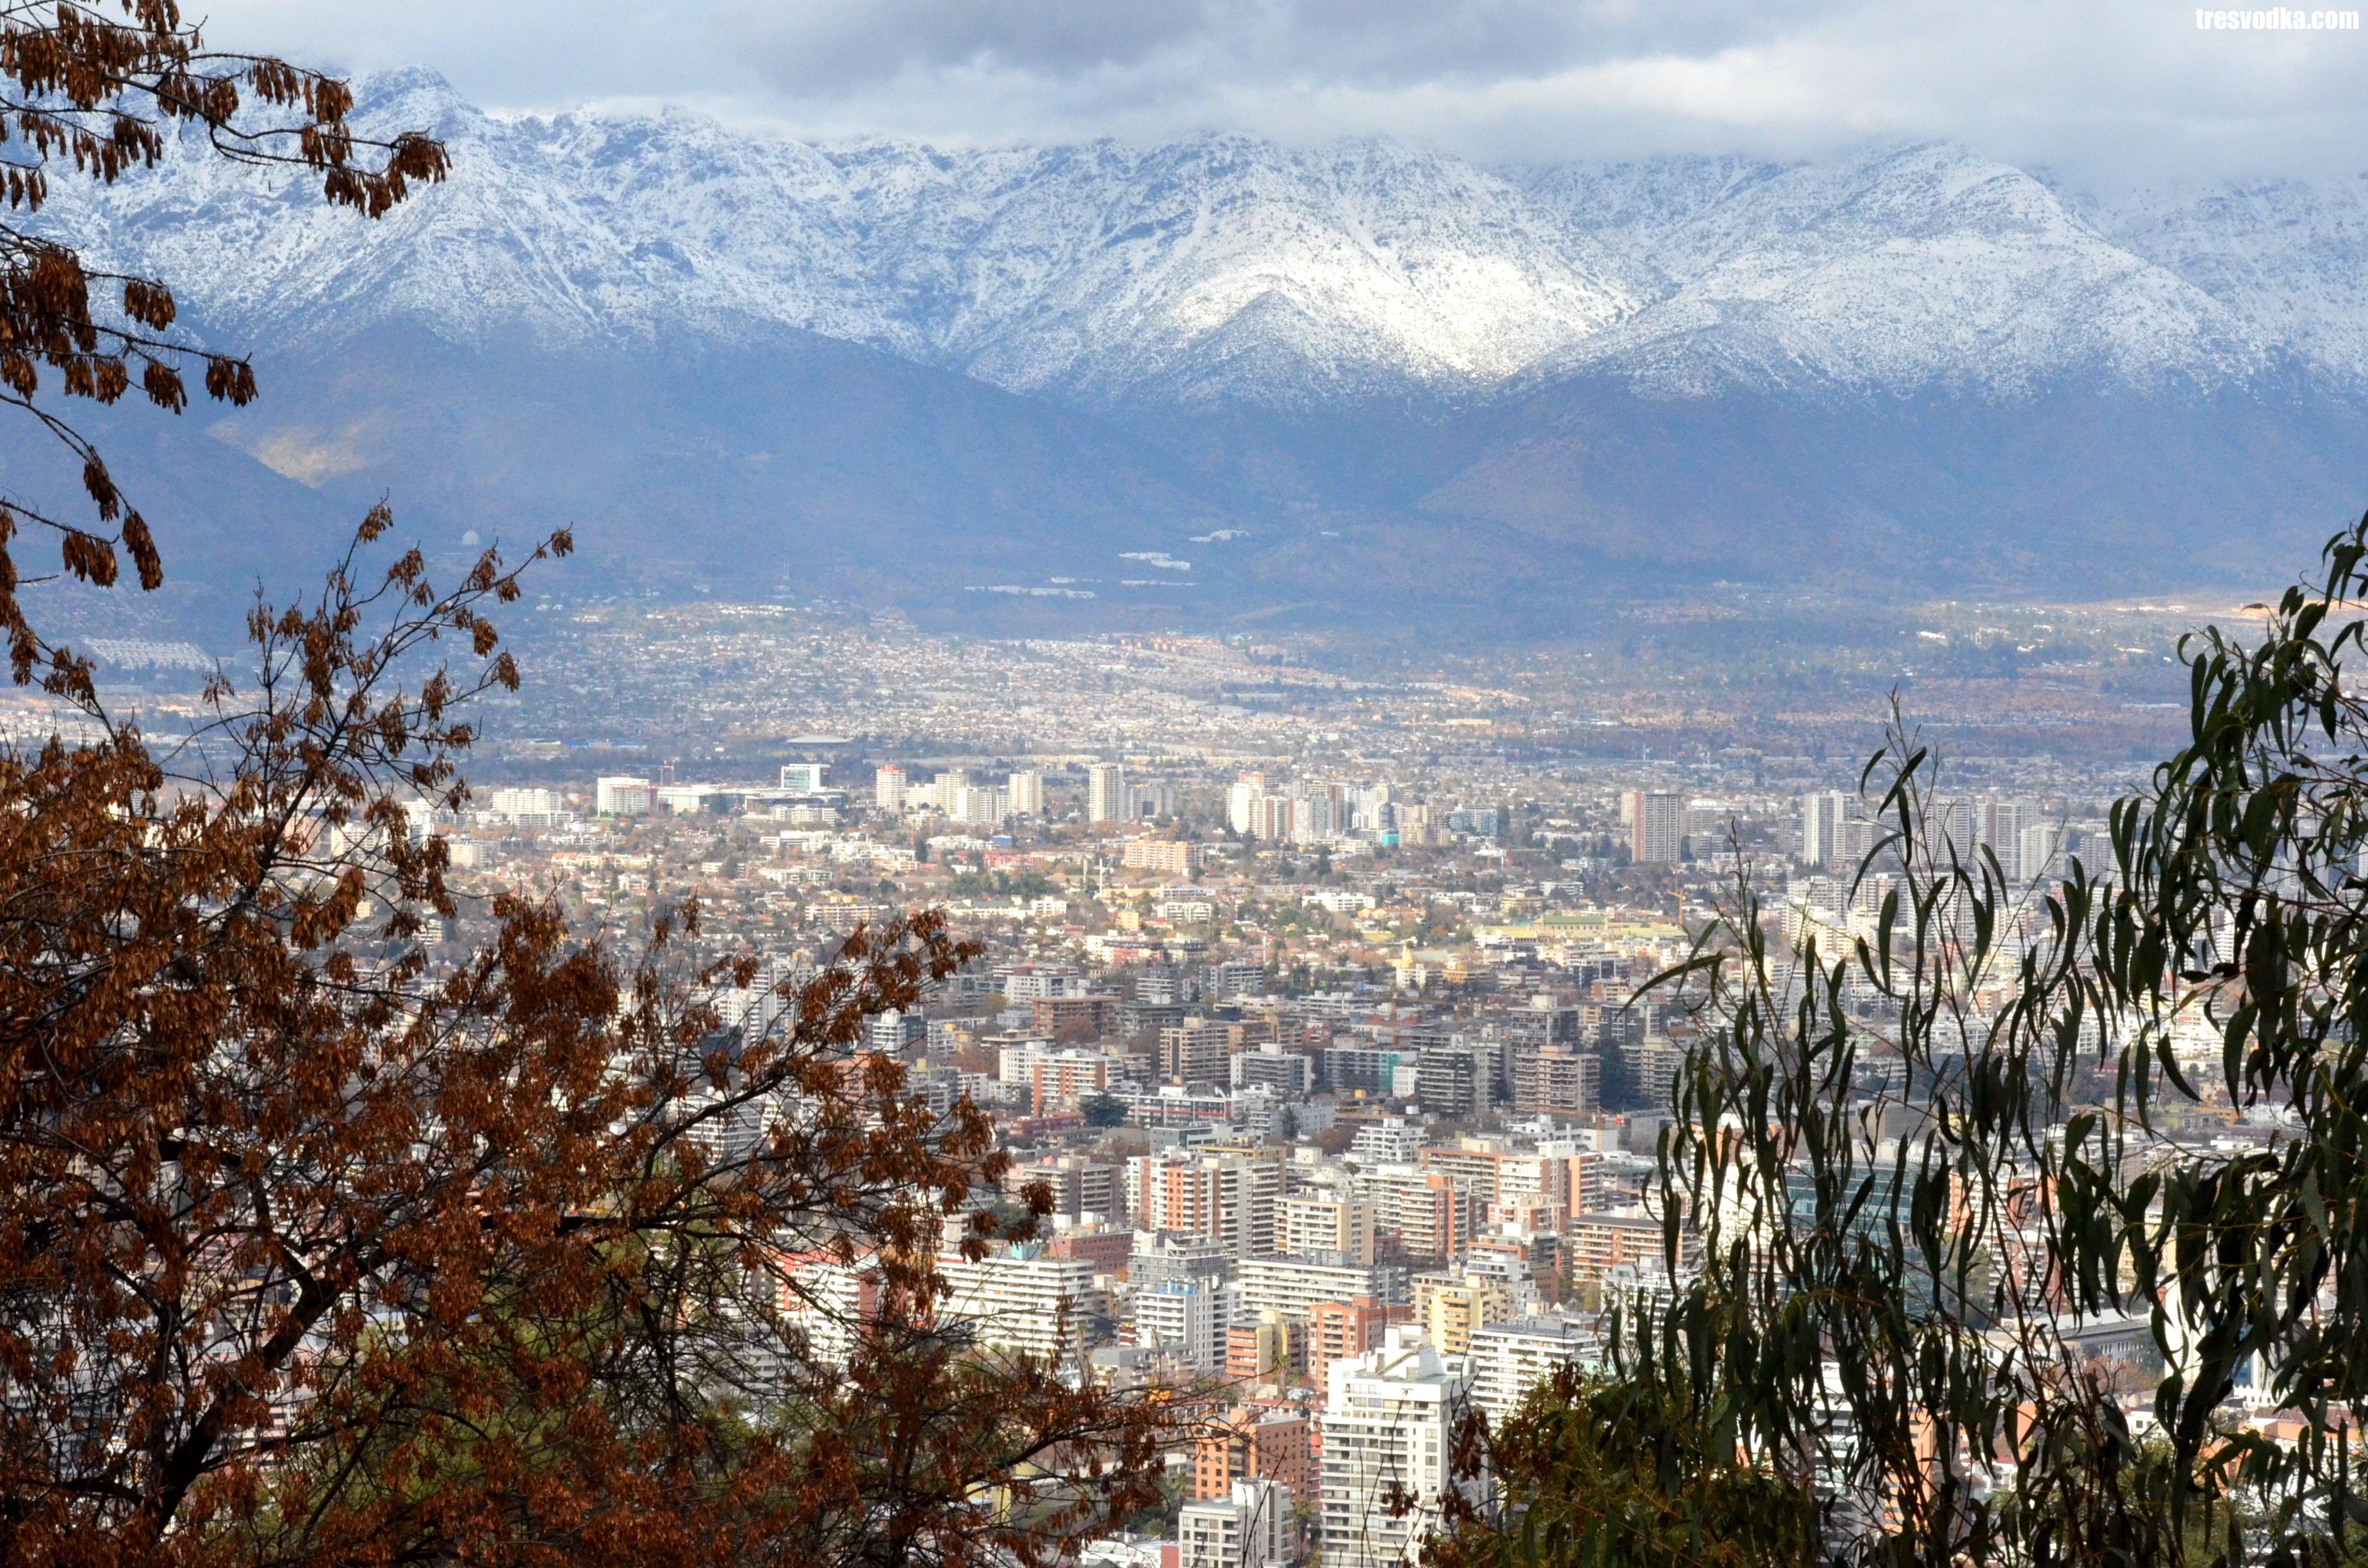 Wzgórze San Cristobal, Santiago de Chile [GALERIA]